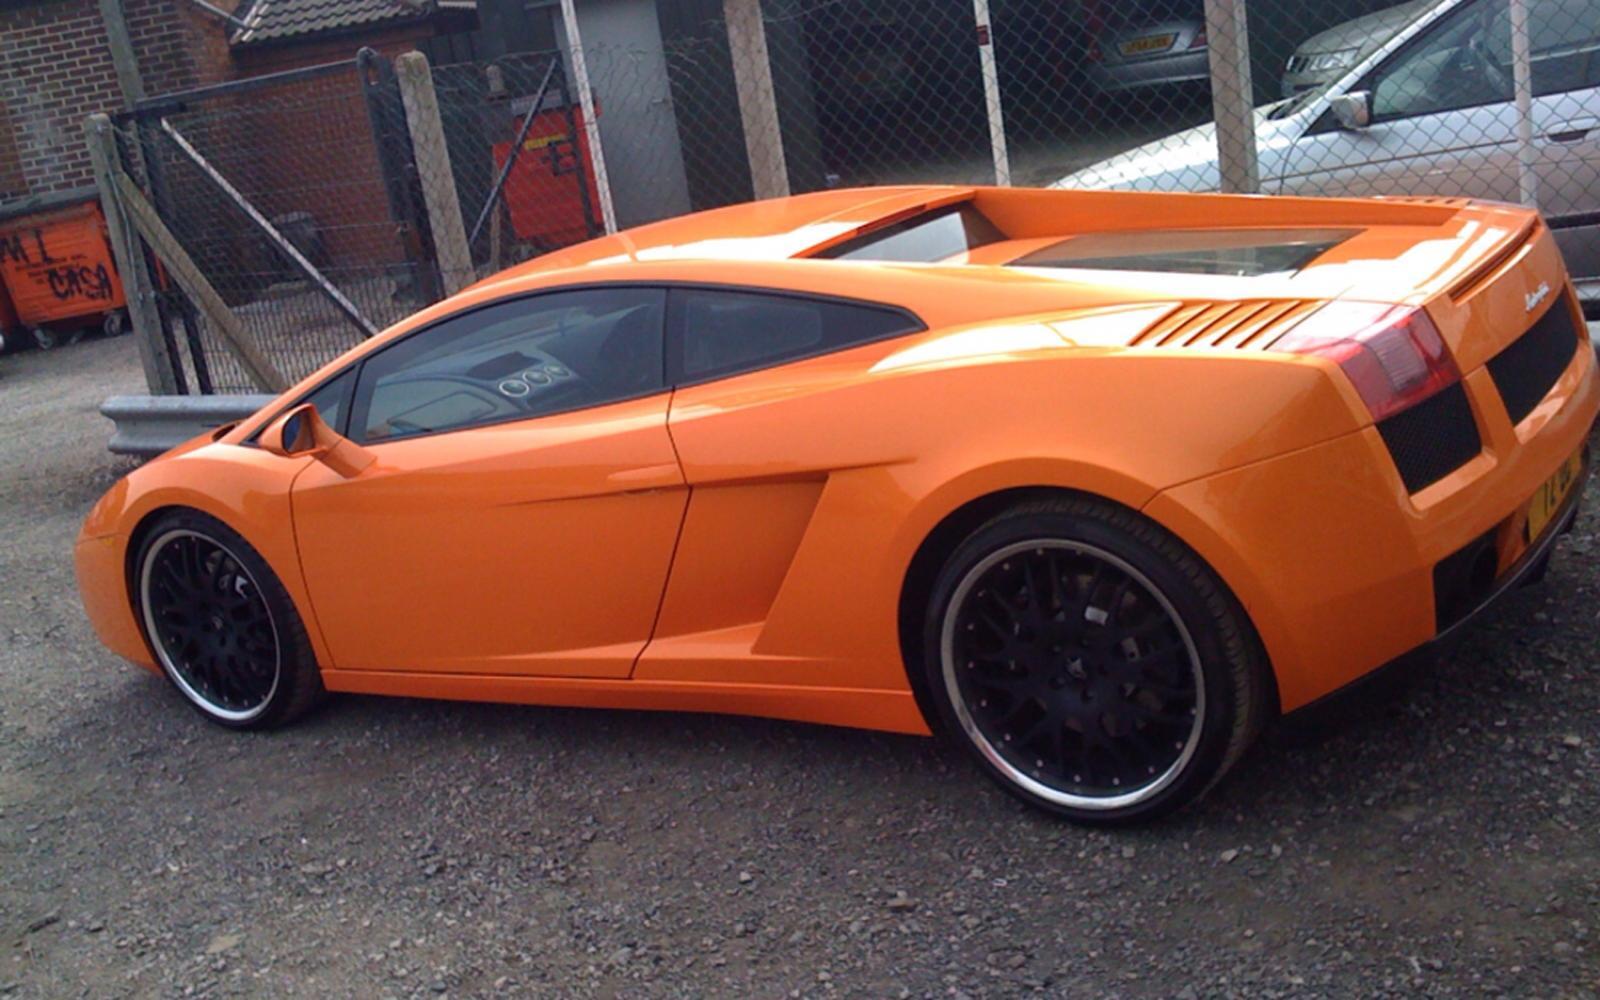 Elegant 2006 Lamborghini Gallardo #11